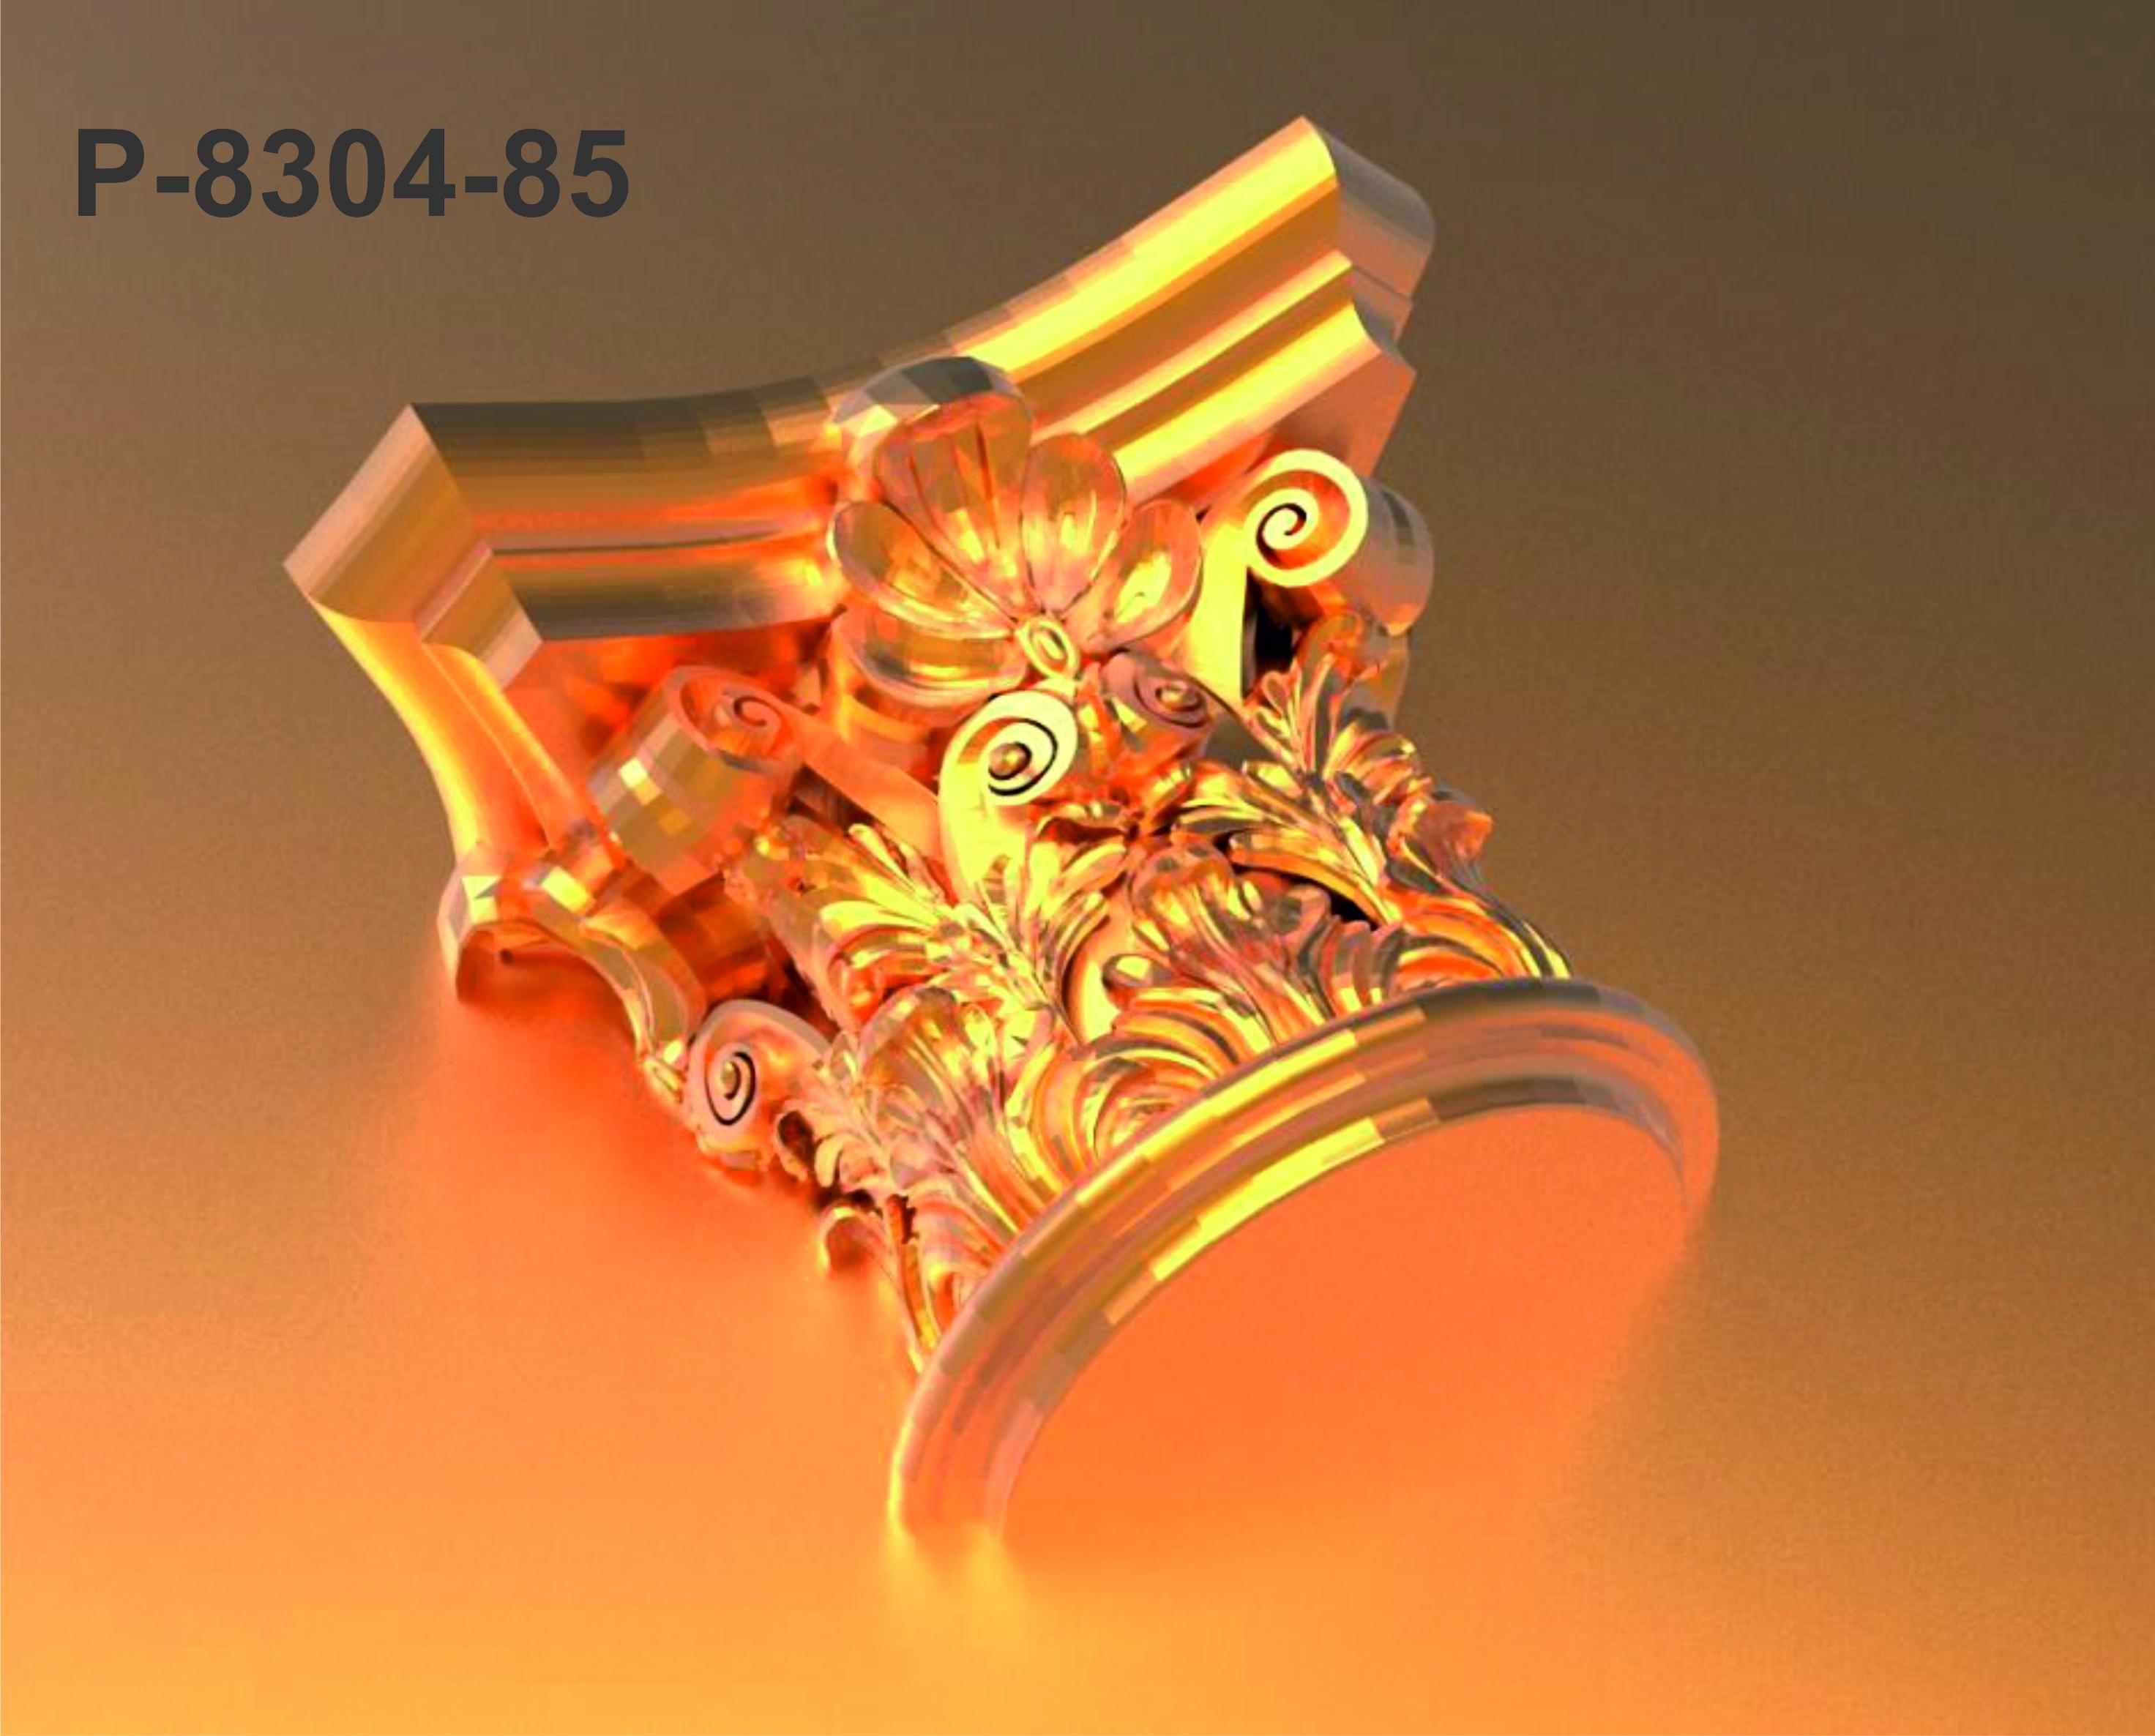 p-5285-polyurethane-decorative-85-cm-diameter-gold-leaf-coated-column-capital-pu-molding-decoration-base-fluted-plain-corinthian-models